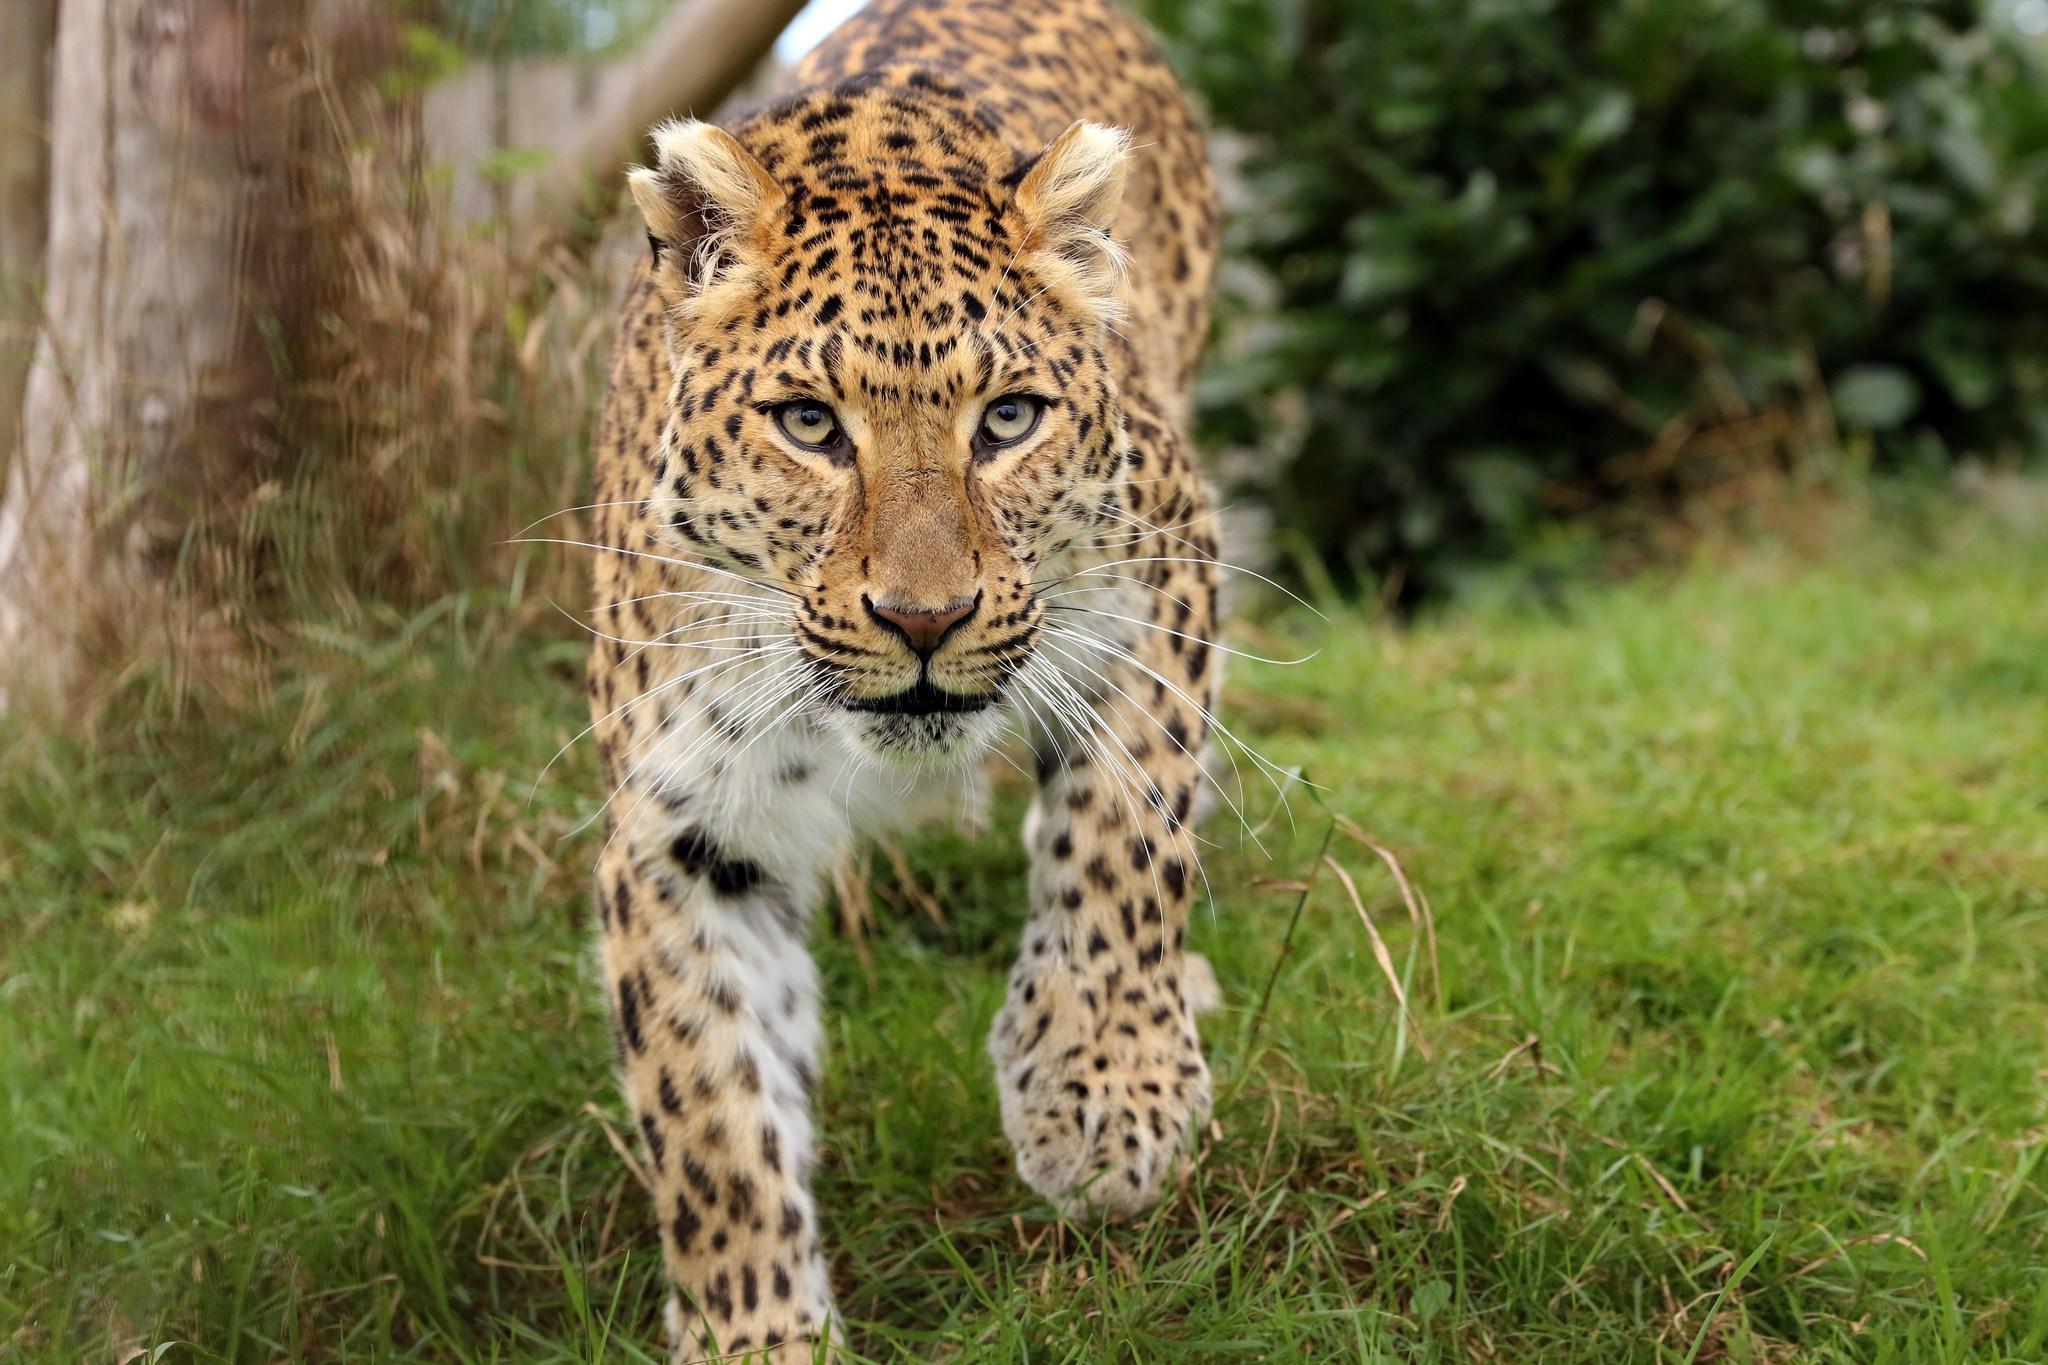 Фото леопарда в природе